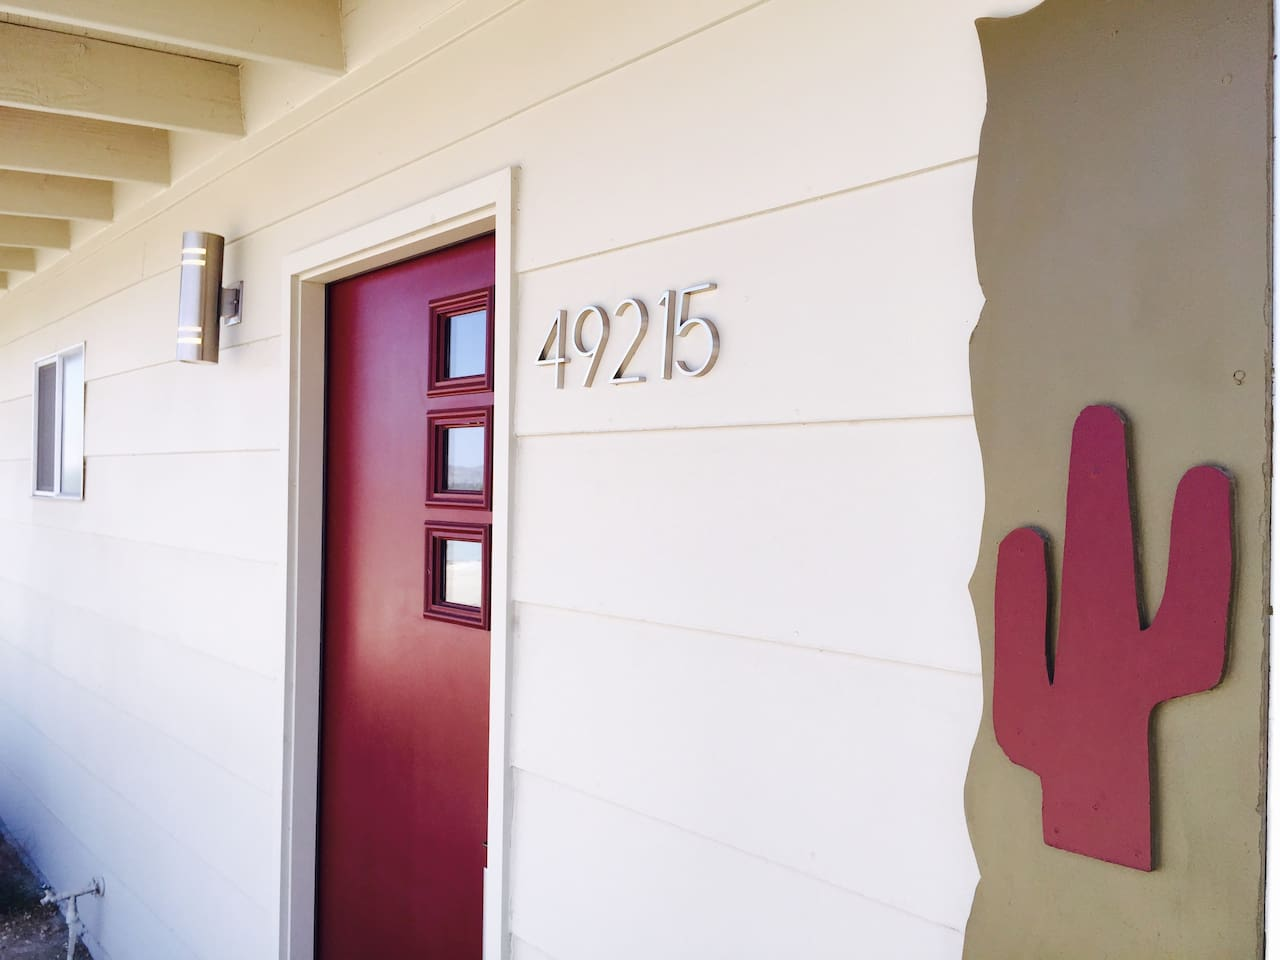 Original saguaro cutouts and a classic door meet you at the front door.